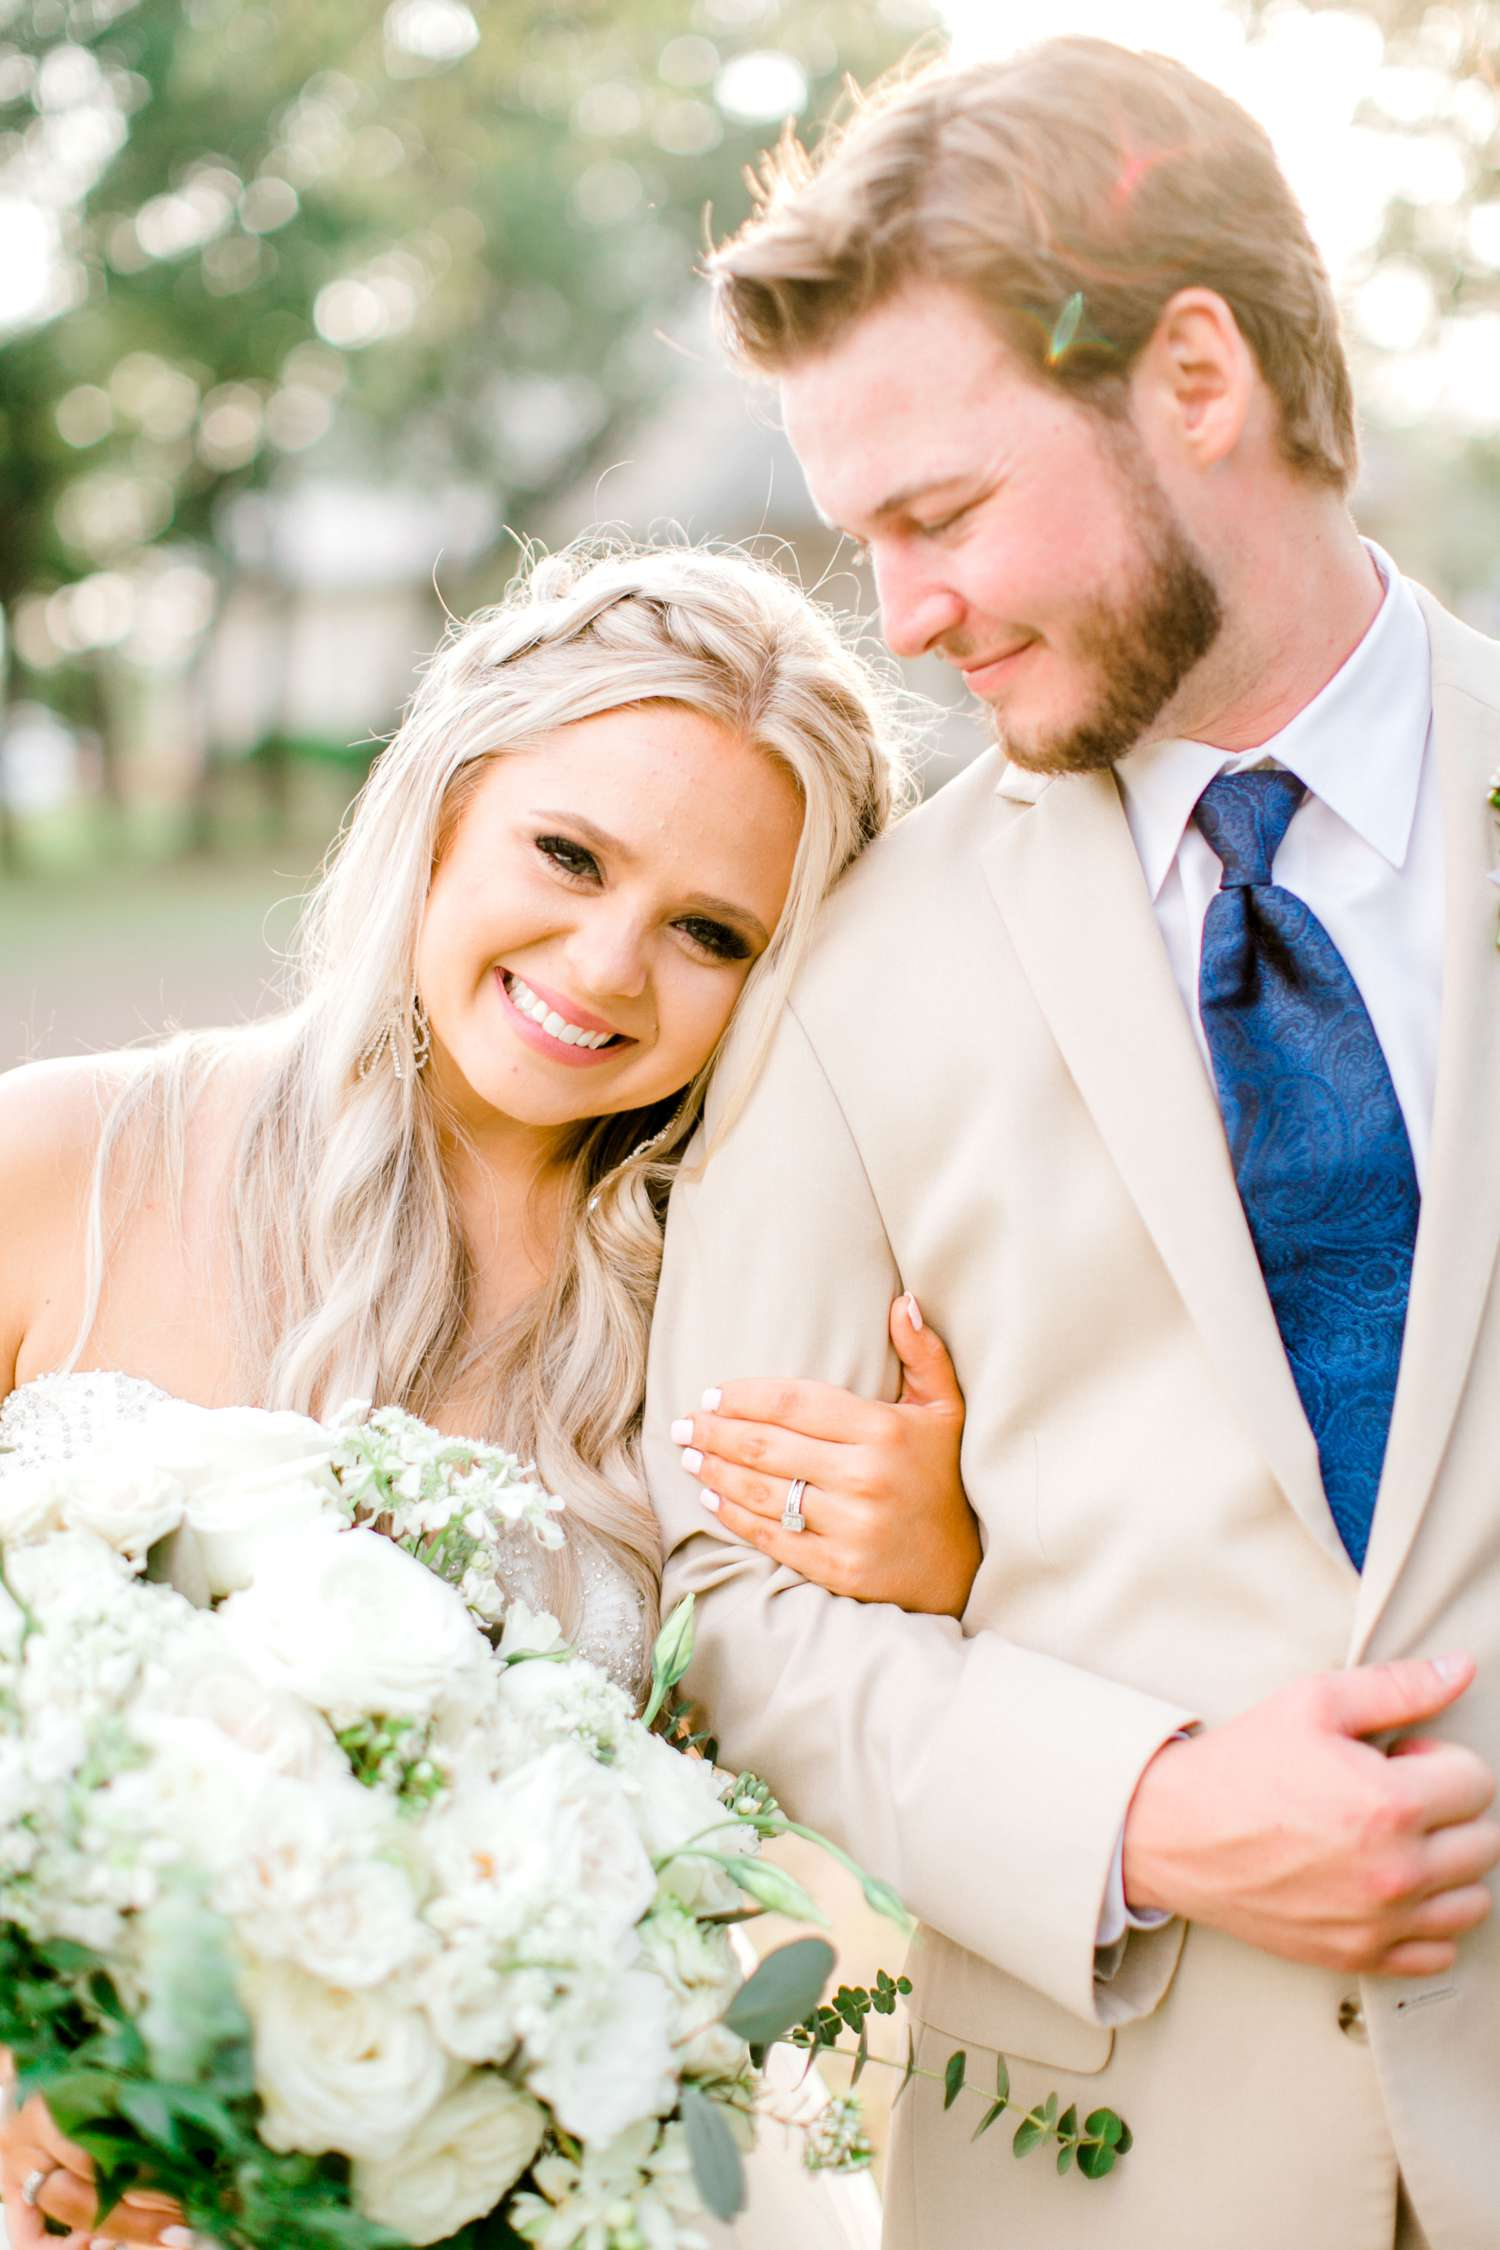 HAYLEE+JUSTIN+GREGORY+HERITAGE_HAUS_AUSTIN_TEXAS_WEDDING_0110.jpg